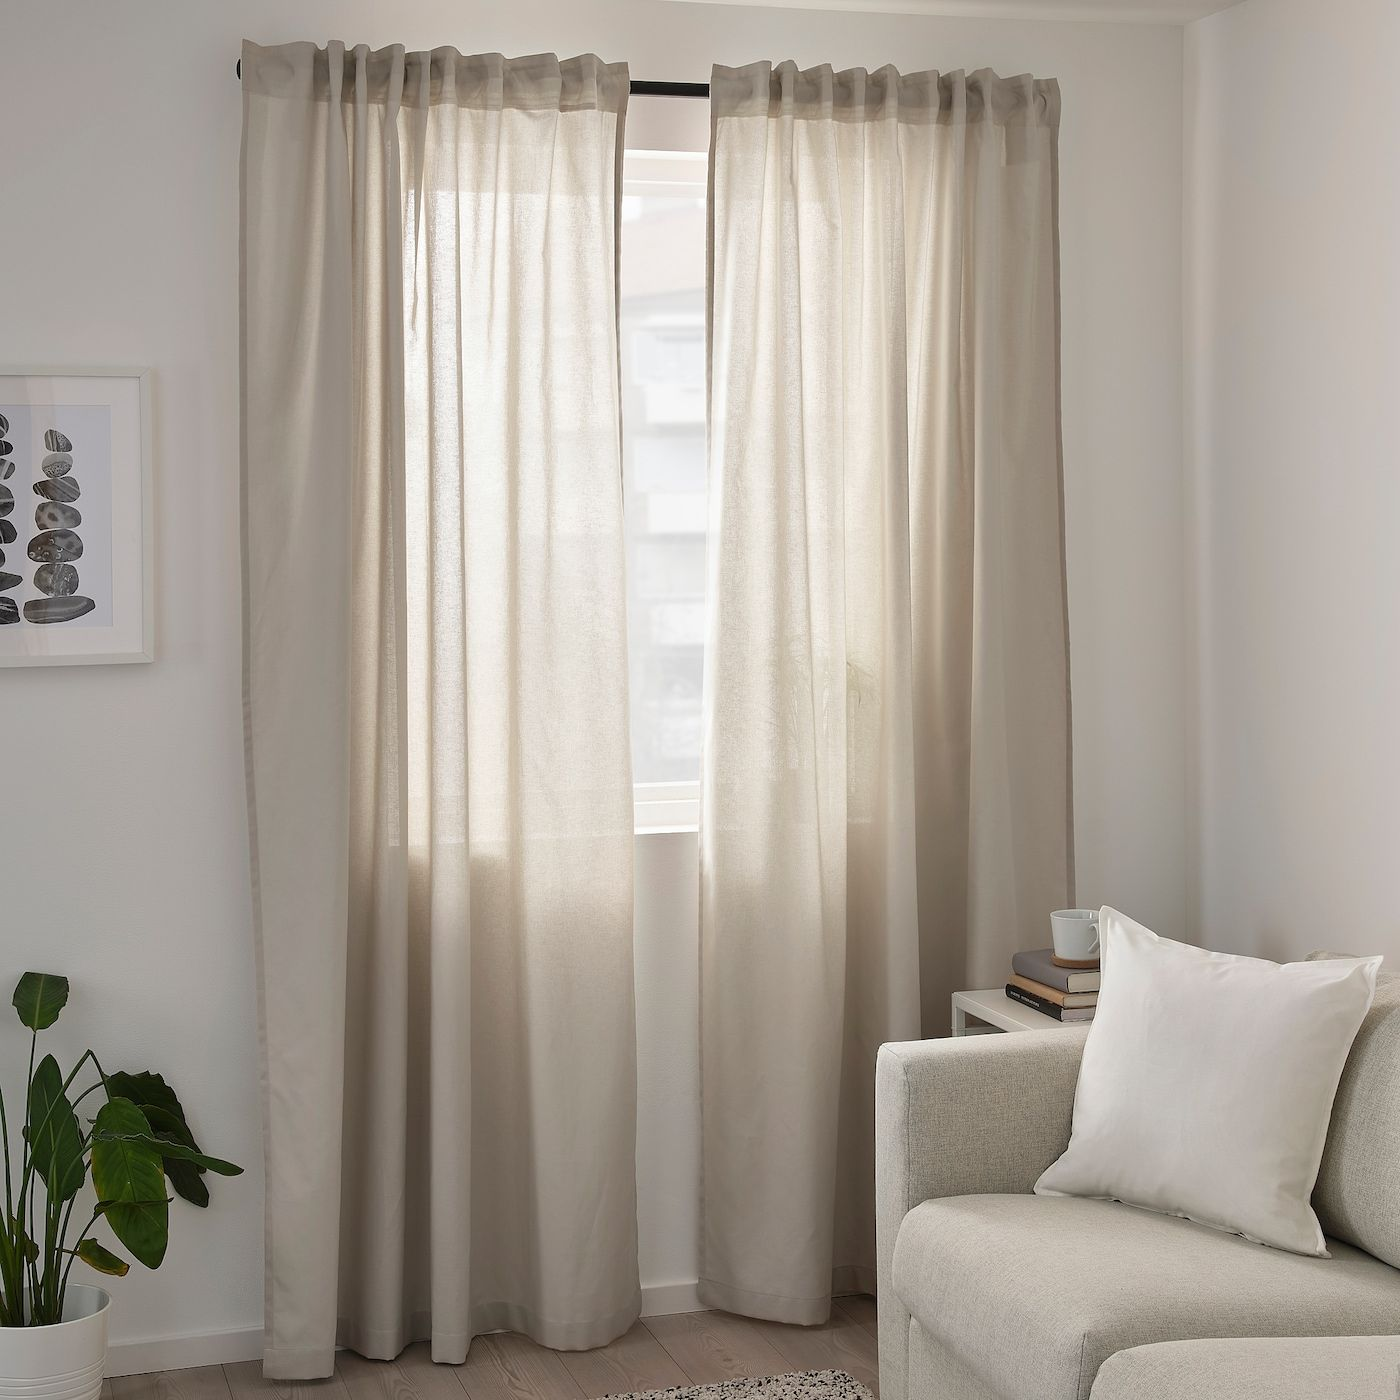 Annalouisa Curtains 1 Pair Beige 57x98 Ikea In 2020 Beige